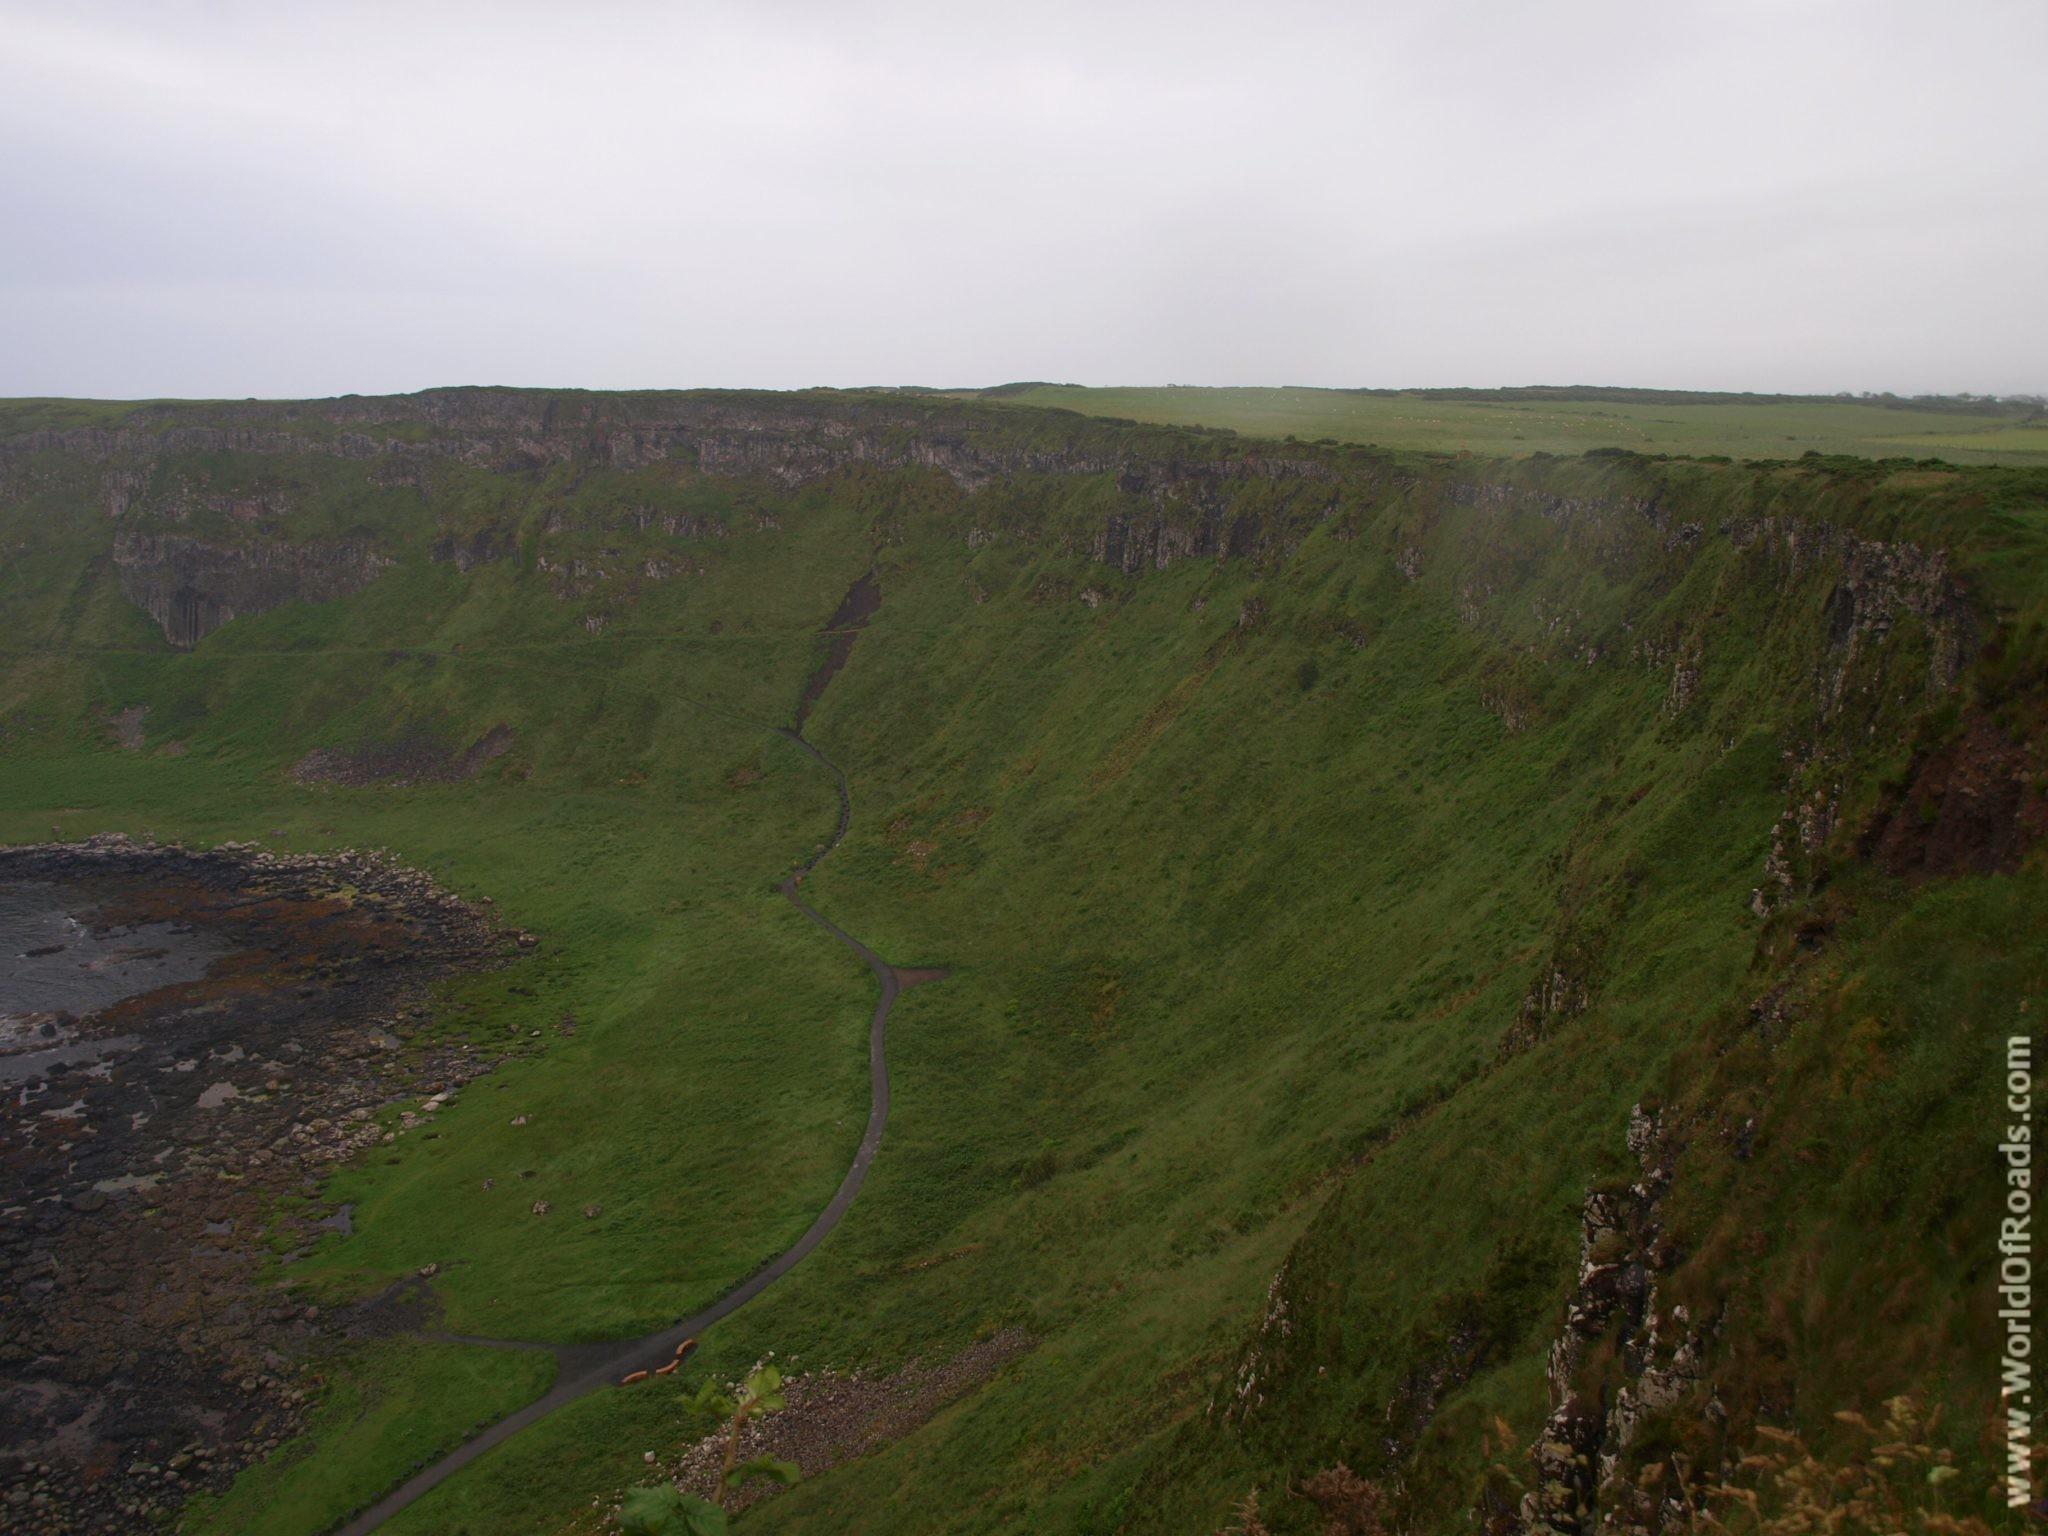 Скалы. Тропа Гиганта (Giant's Causeway). Северная Ирландия.